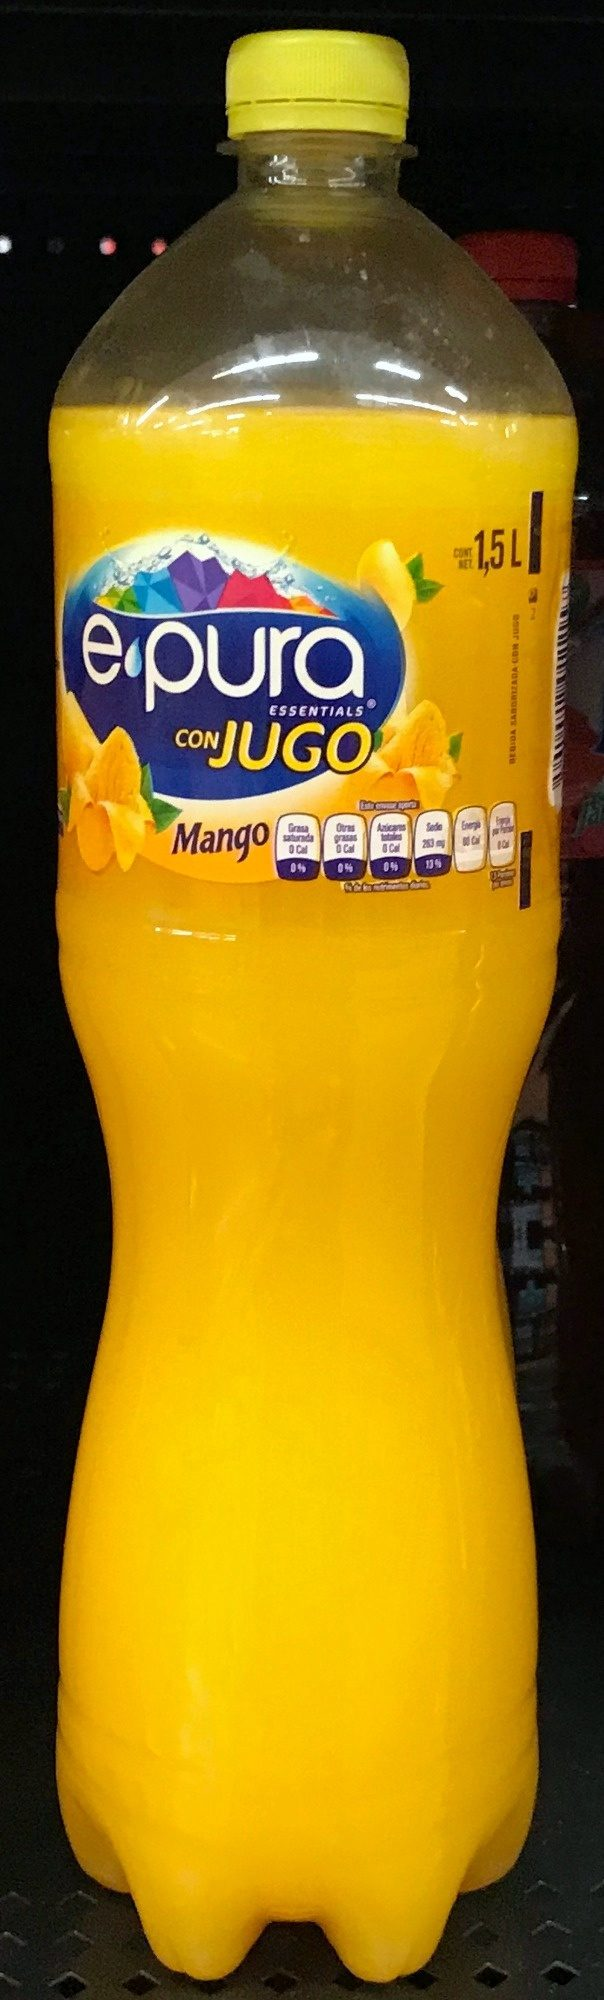 Agua con jugo de mango - Product - es